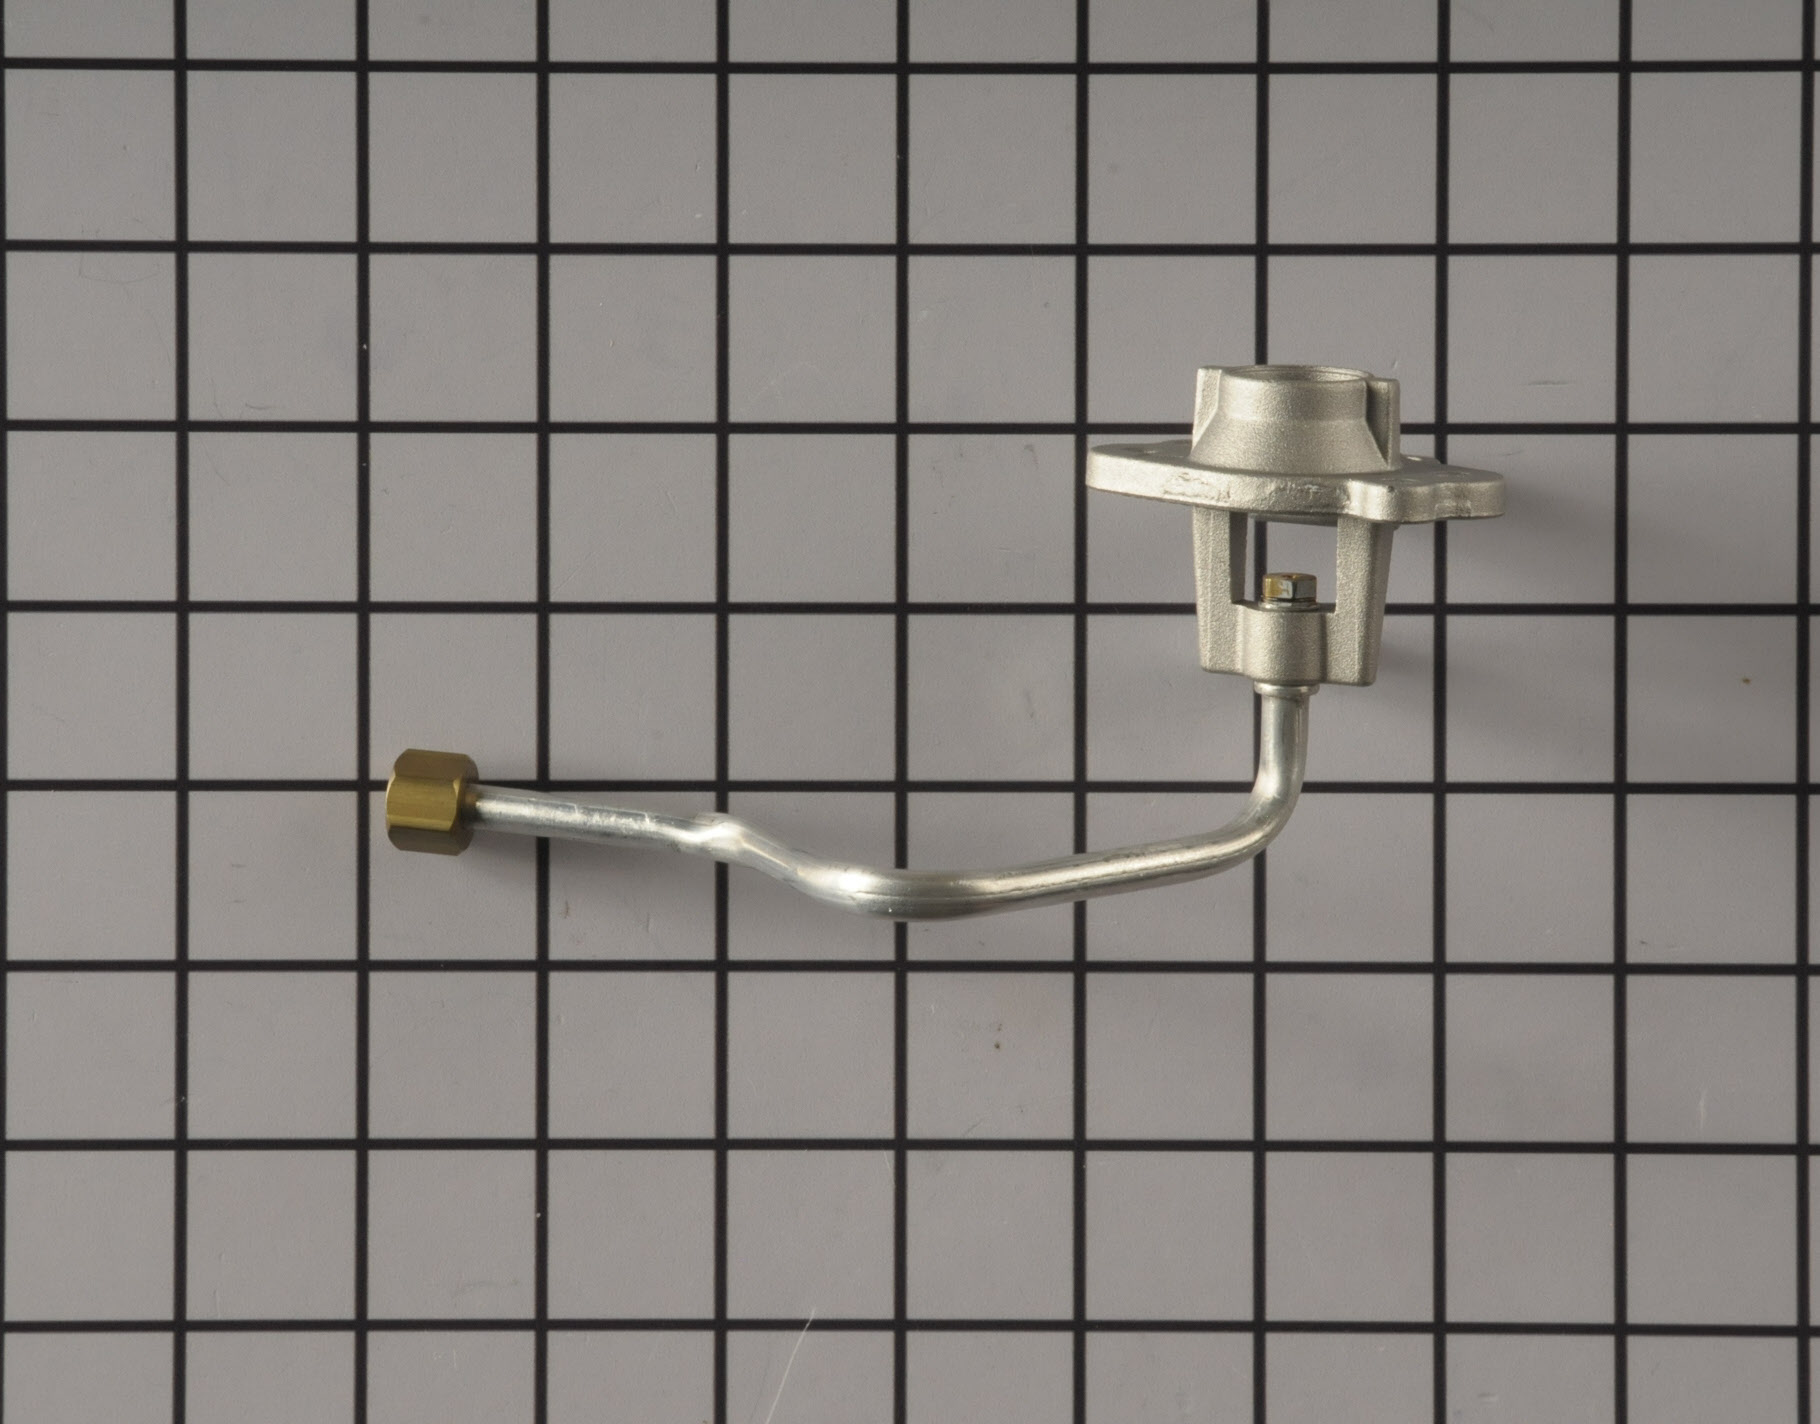 Ikea Range/Stove/Oven Part # W11197500 - Surface Burner Orifice Holder